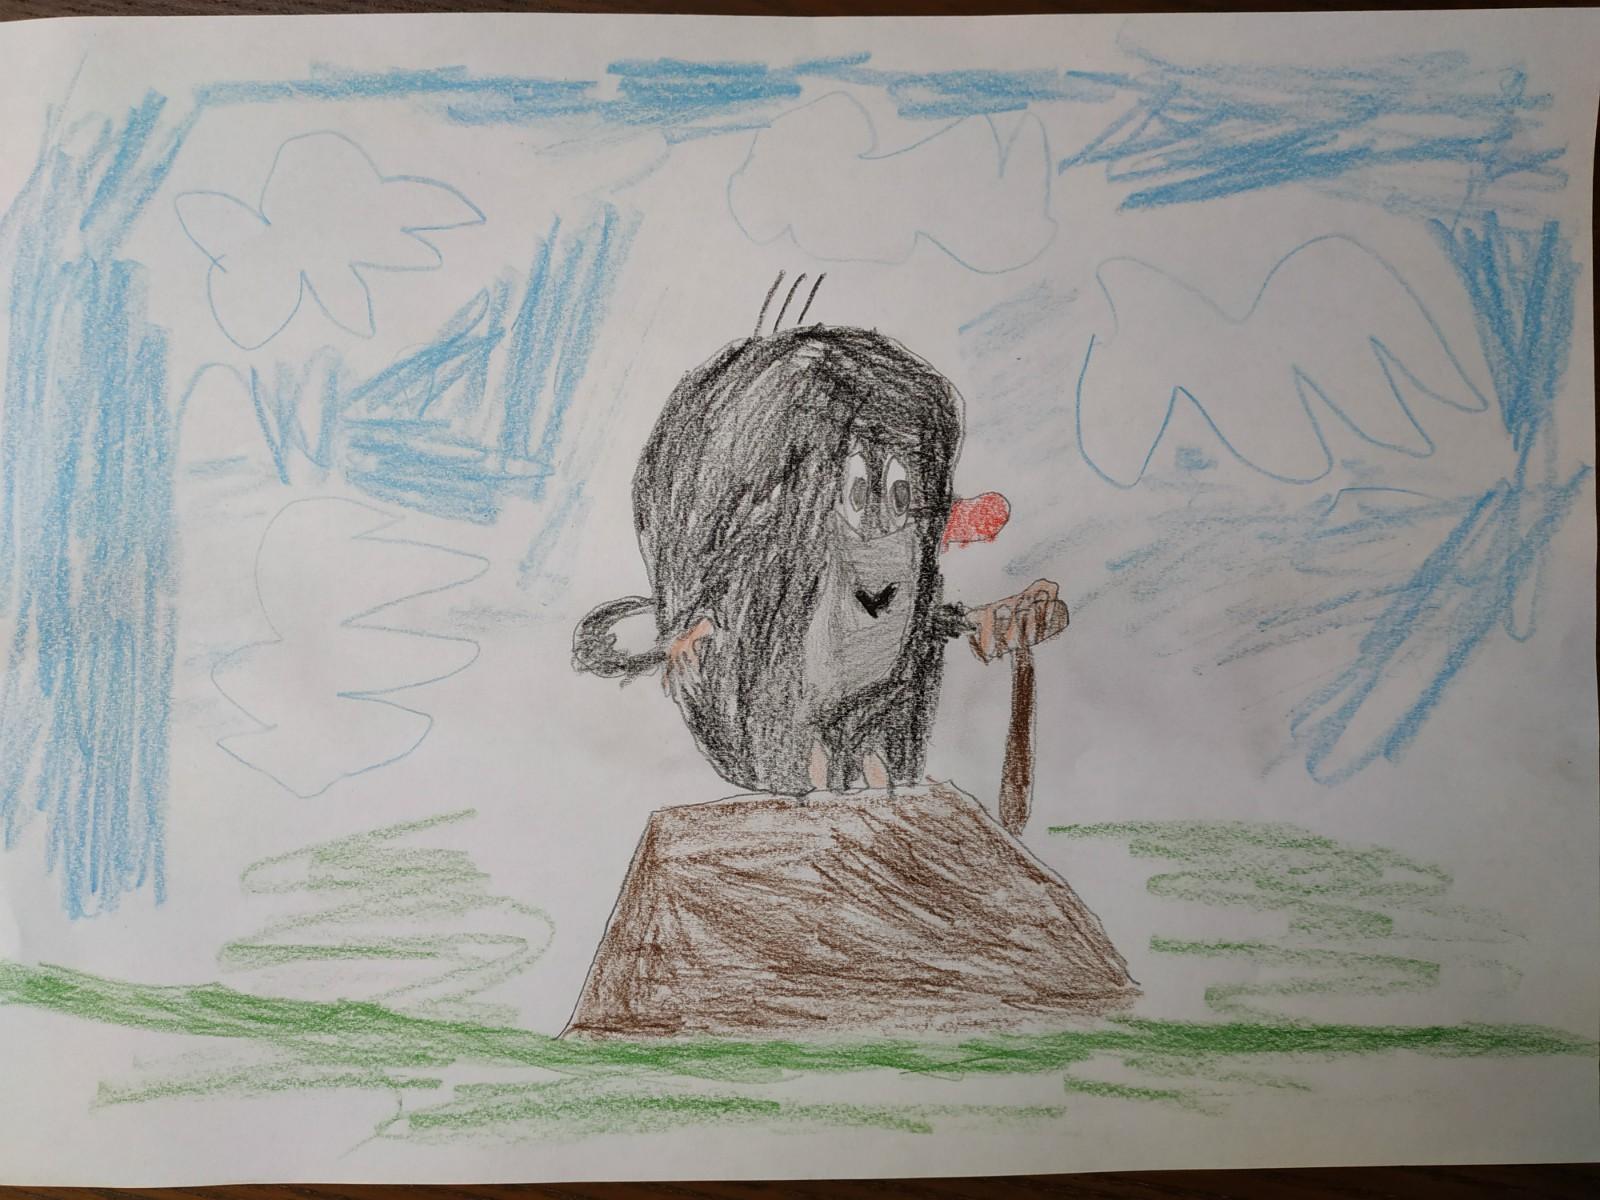 obrázek krtka